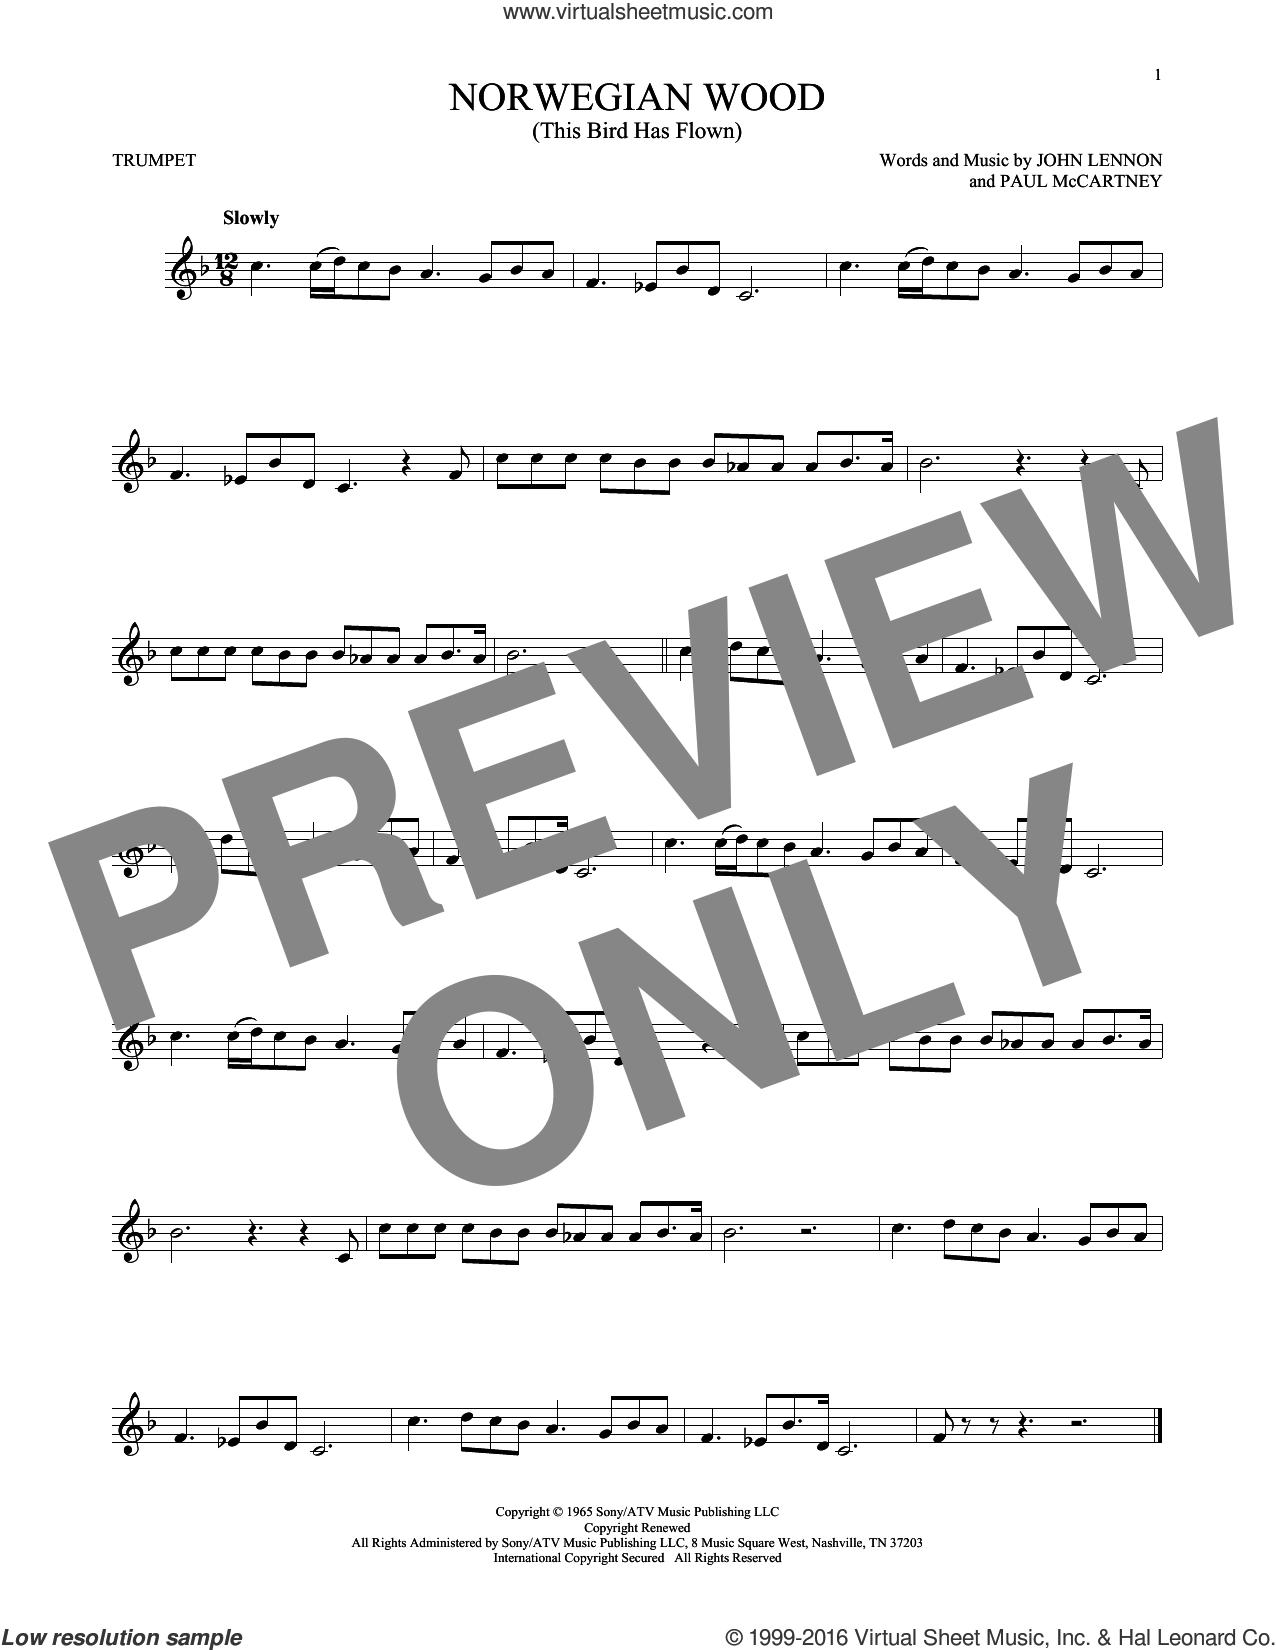 Norwegian Wood (This Bird Has Flown) sheet music for trumpet solo by The Beatles, John Lennon and Paul McCartney, intermediate skill level